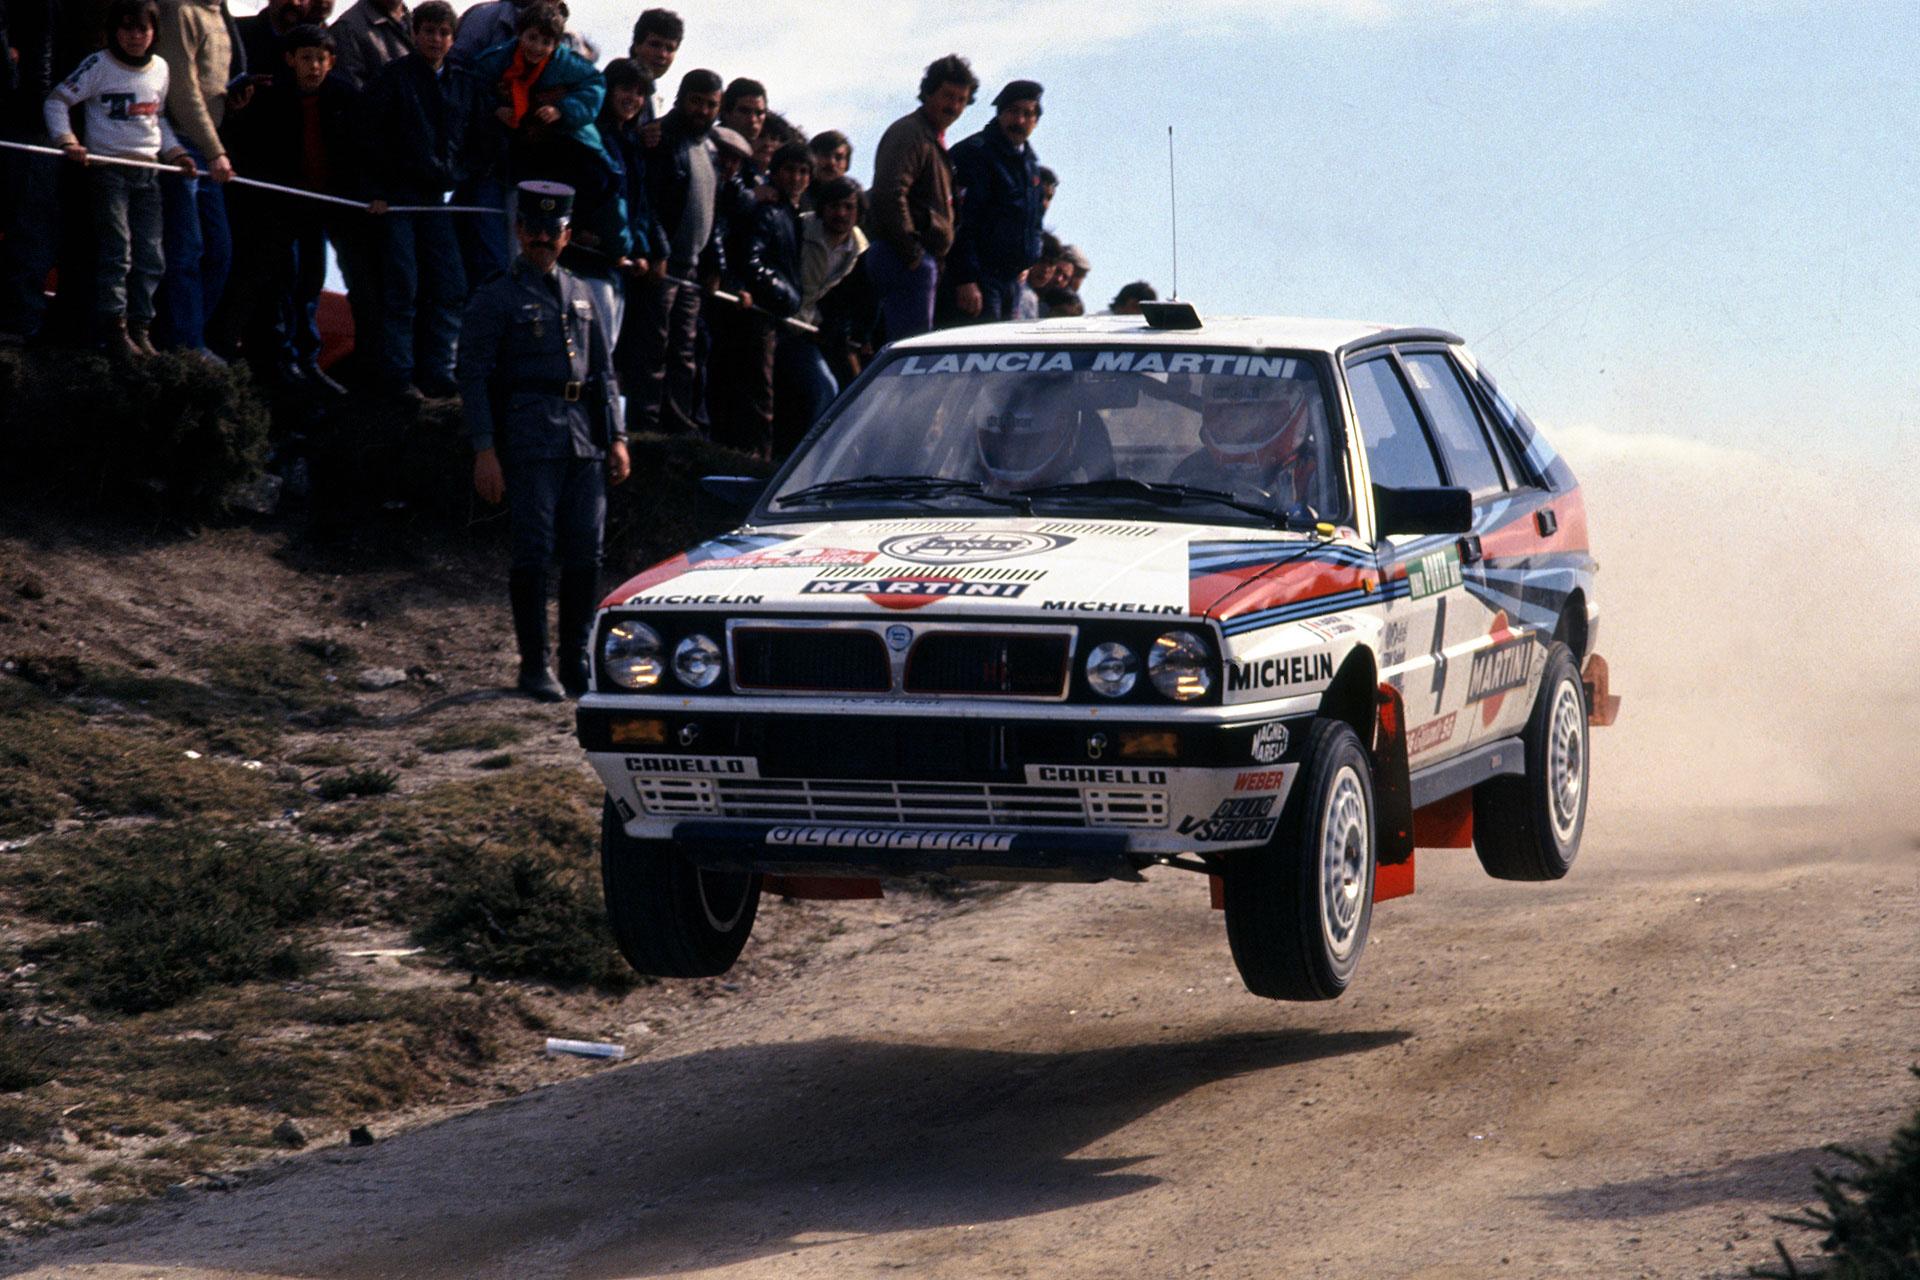 1988 lancia delta hf integrale 8v group a